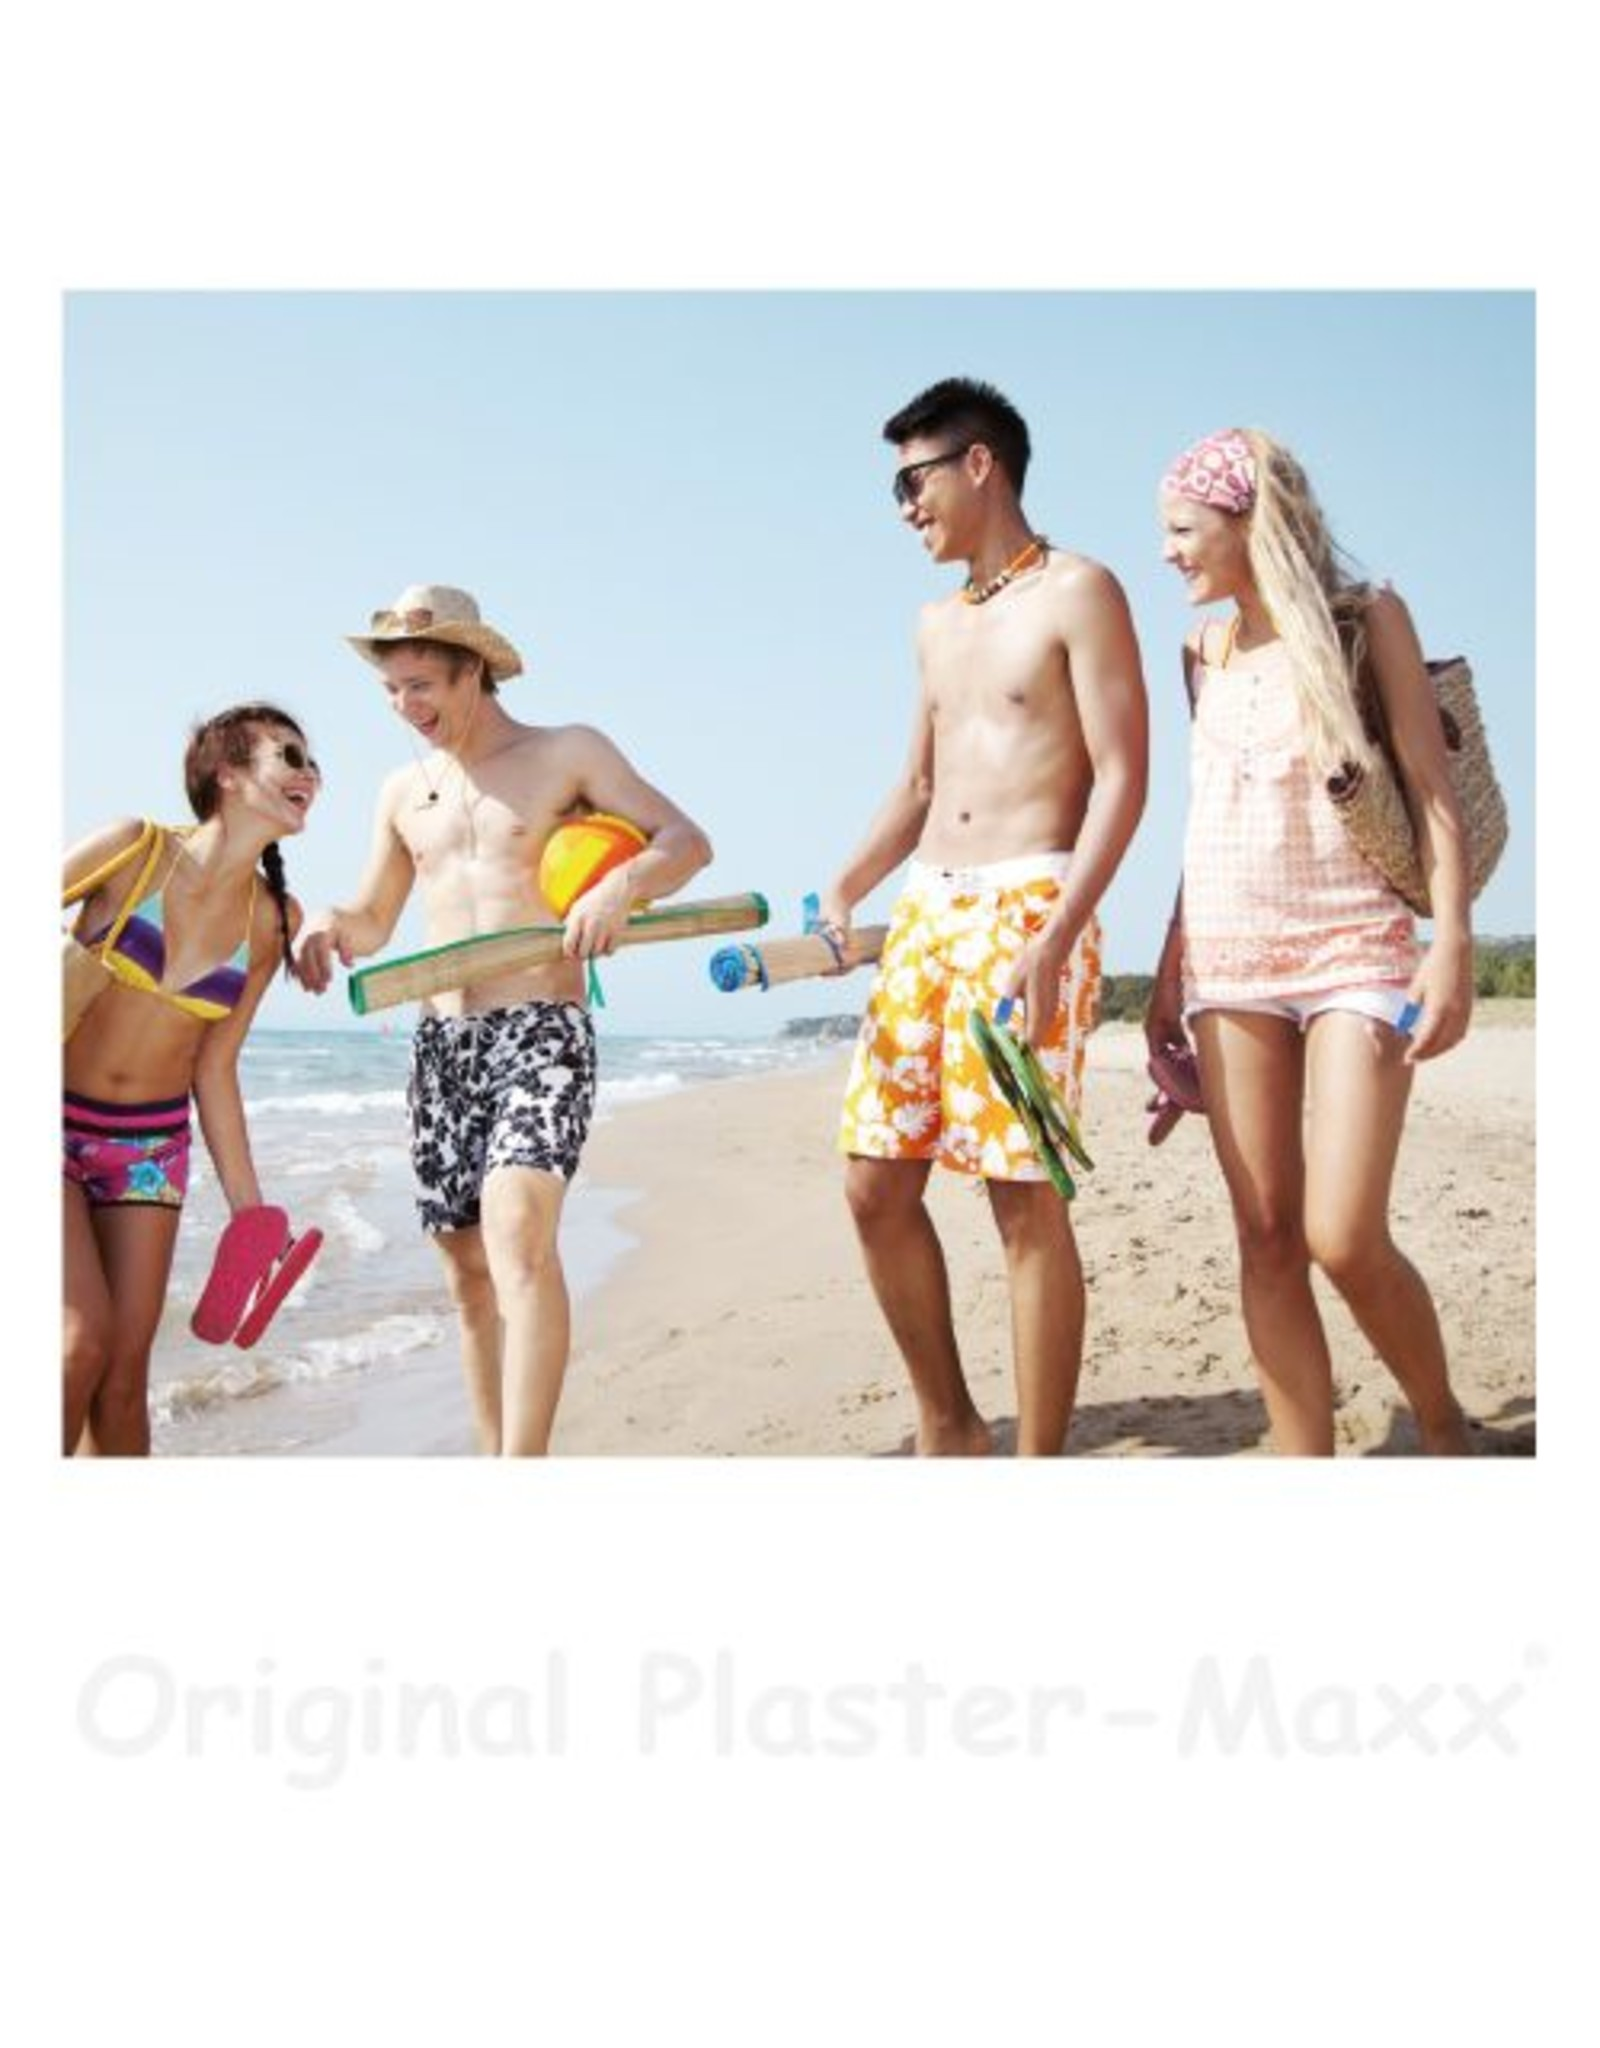 Plaster-Maxx Plaster-Maxx - Valueset 3xBlue